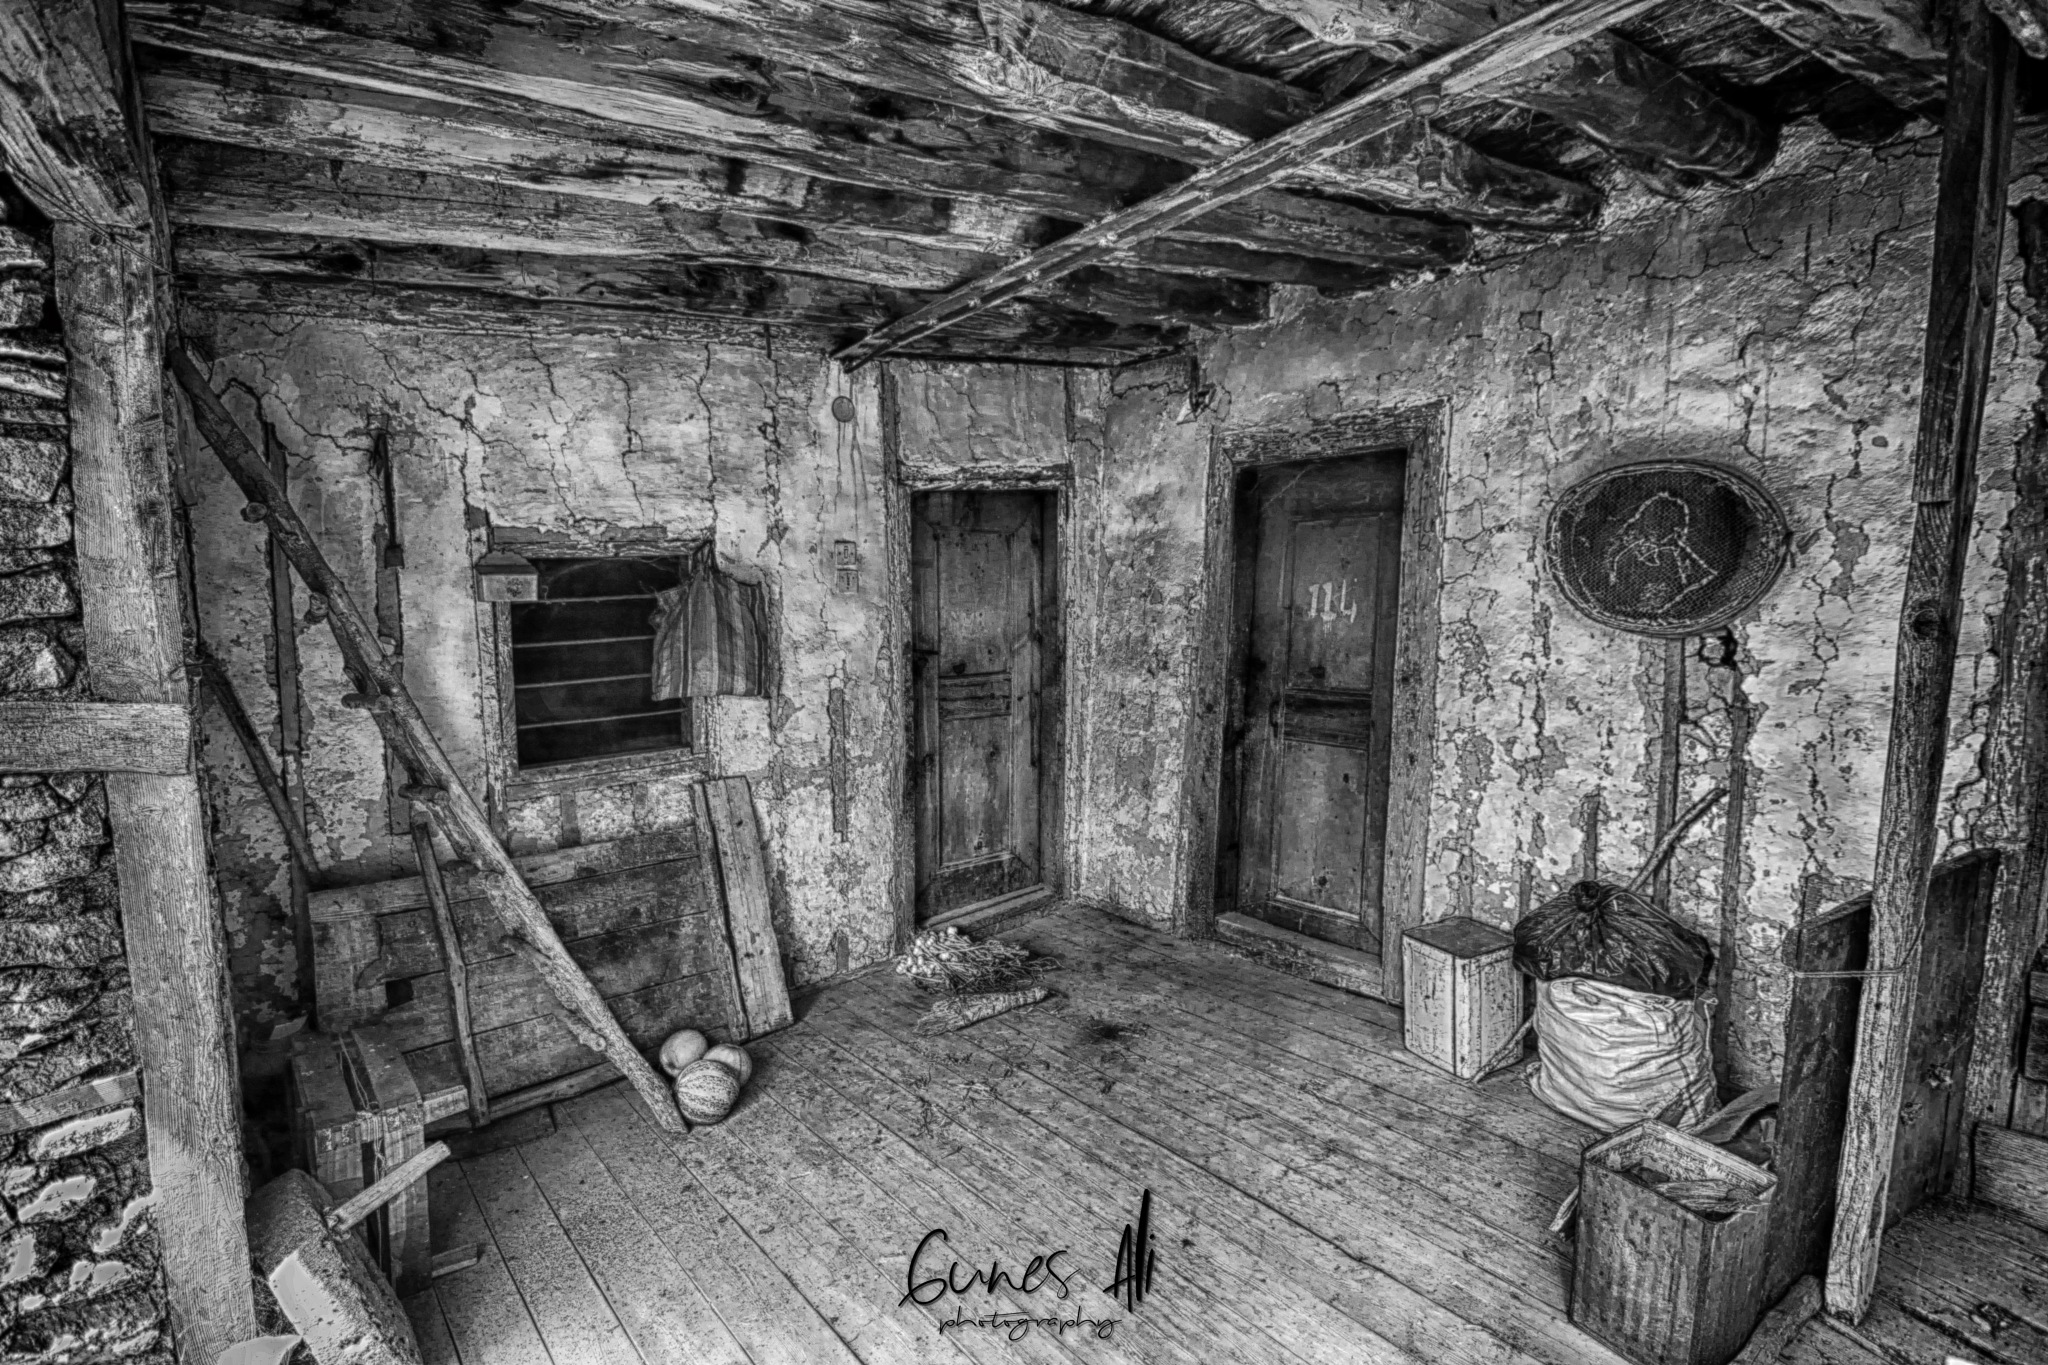 köy evi by gunesali.photography